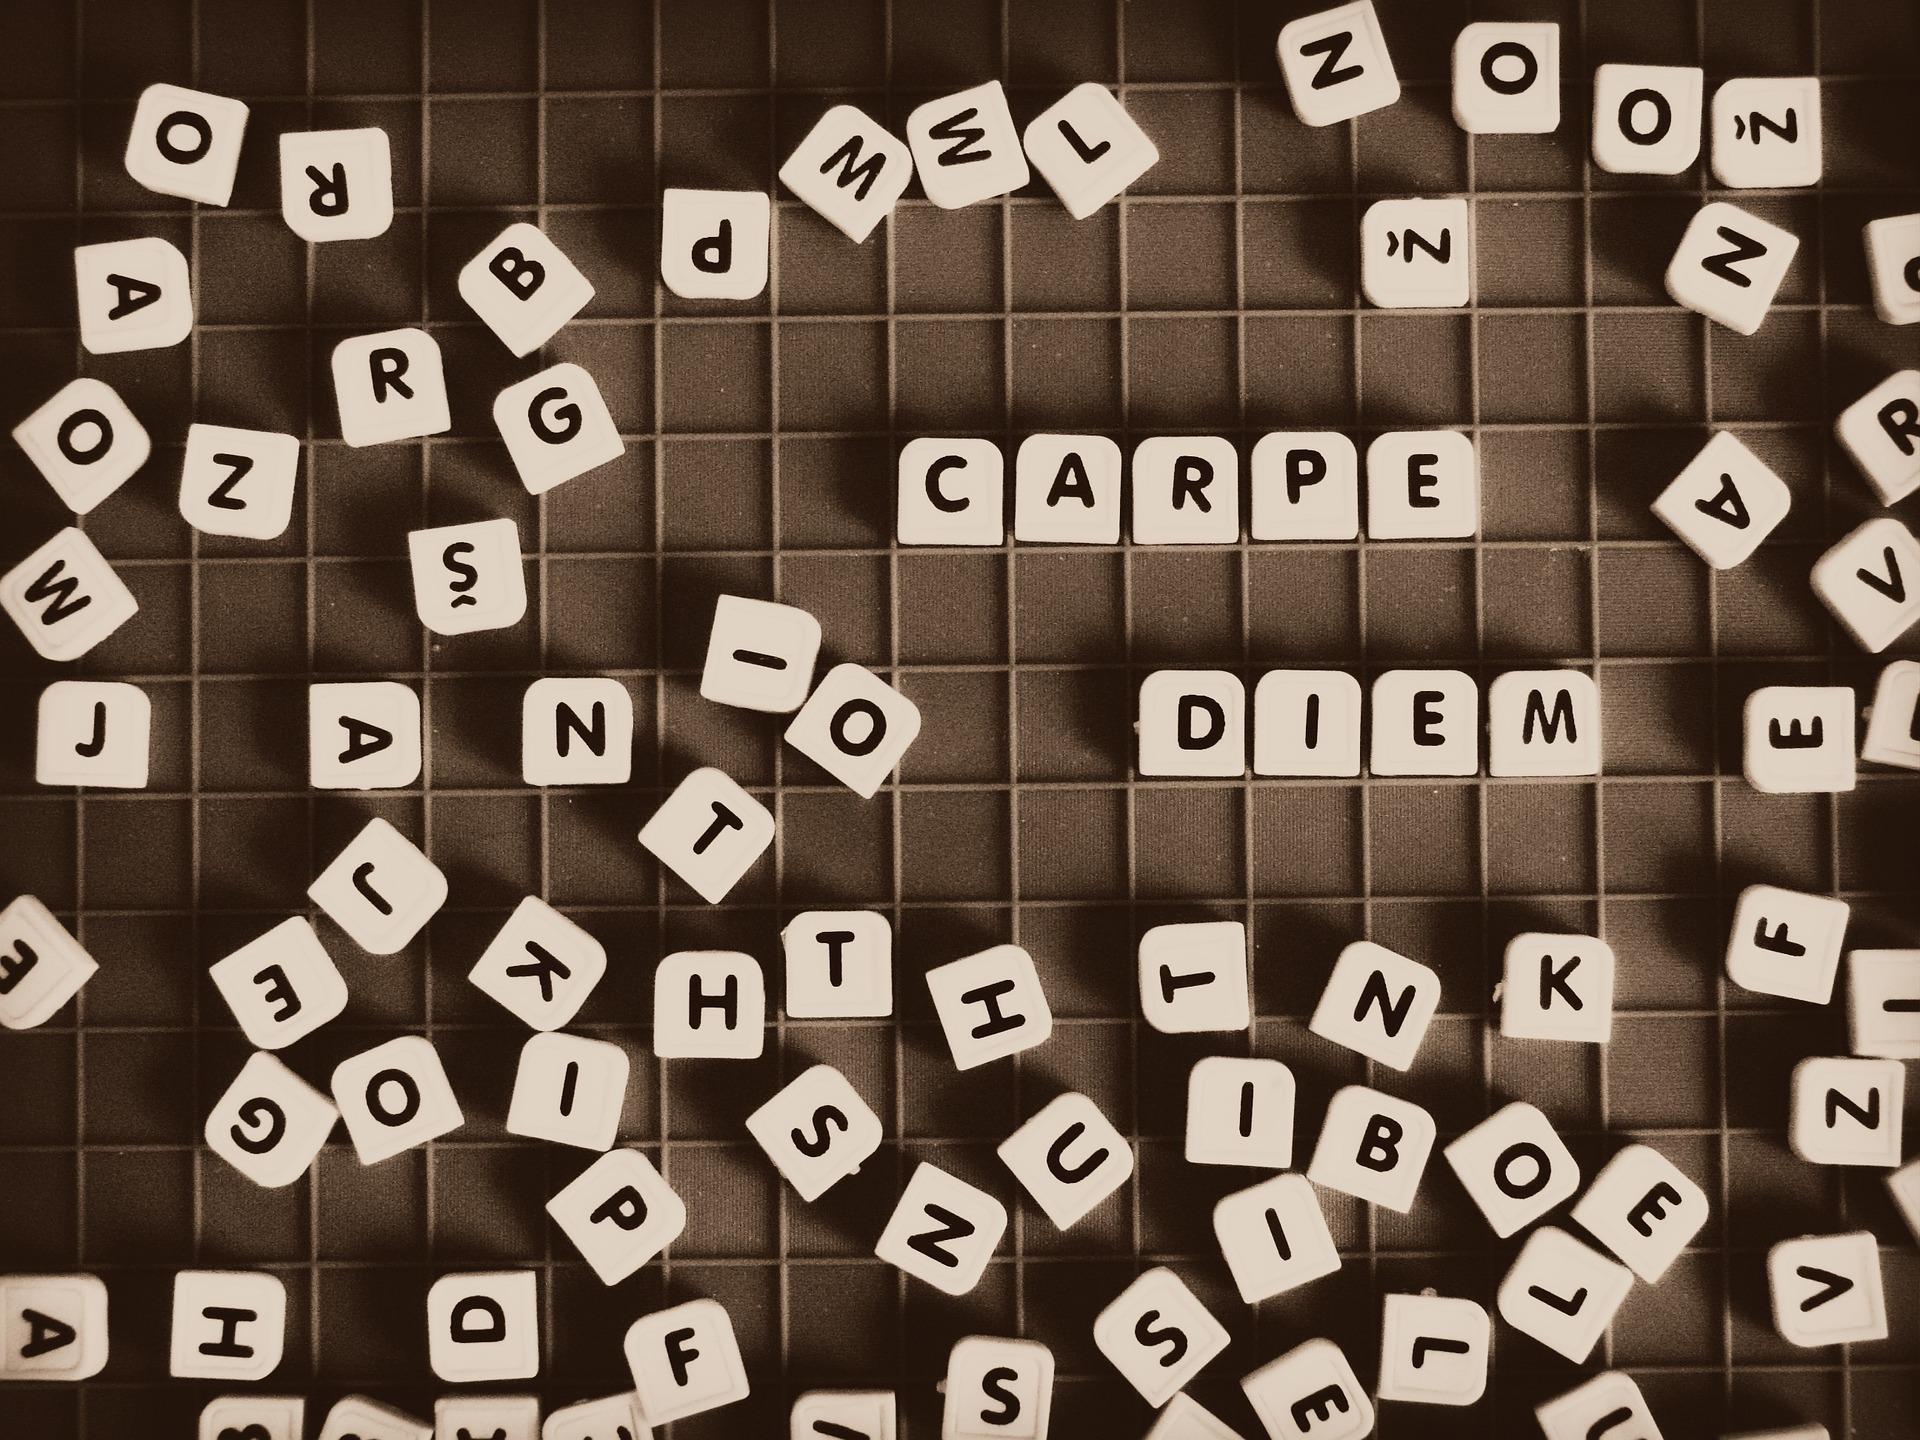 शब्द, खेल, डेटिंग, गीत, जीवन - HD वॉलपेपर - प्रोफेसर-falken.com